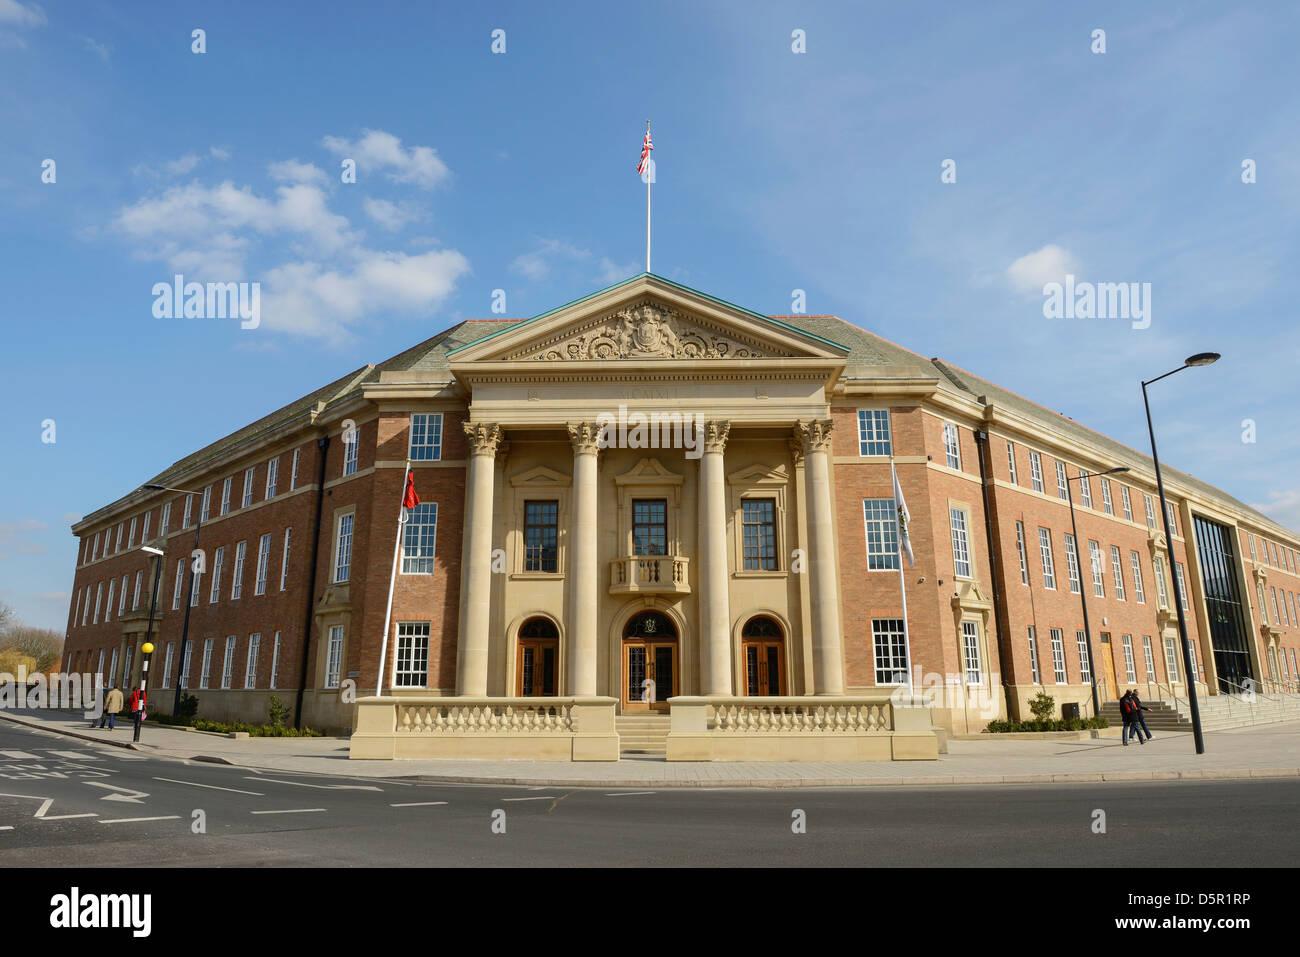 derby-city-council-offices-D5R1RP.jpg